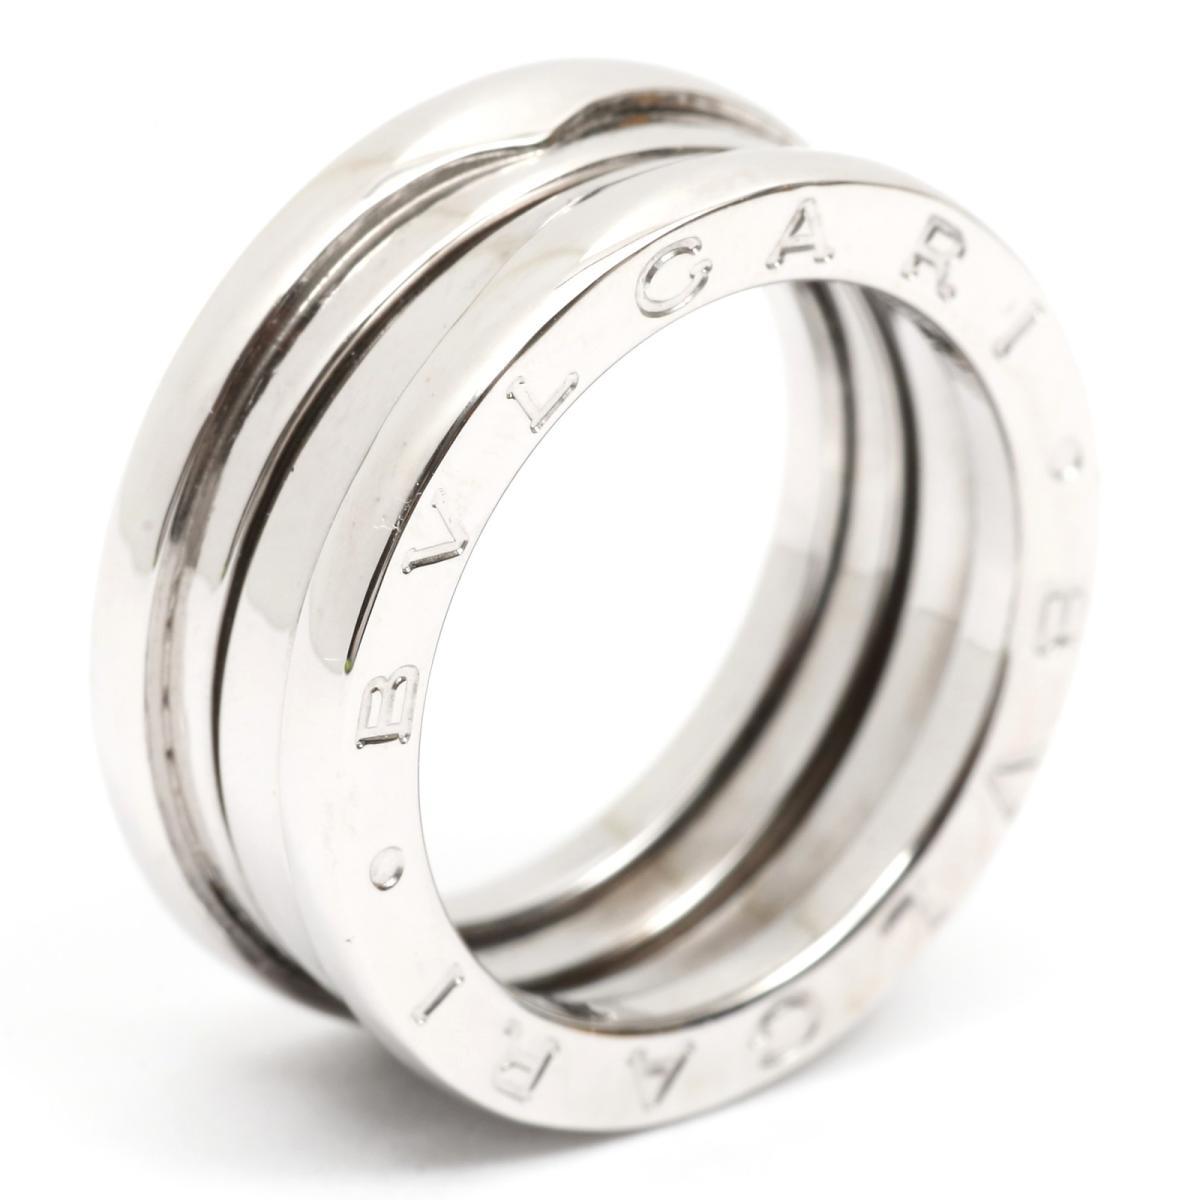 B-zero1 リング Sサイズ ビーゼロワン 指輪 #51/10.5号